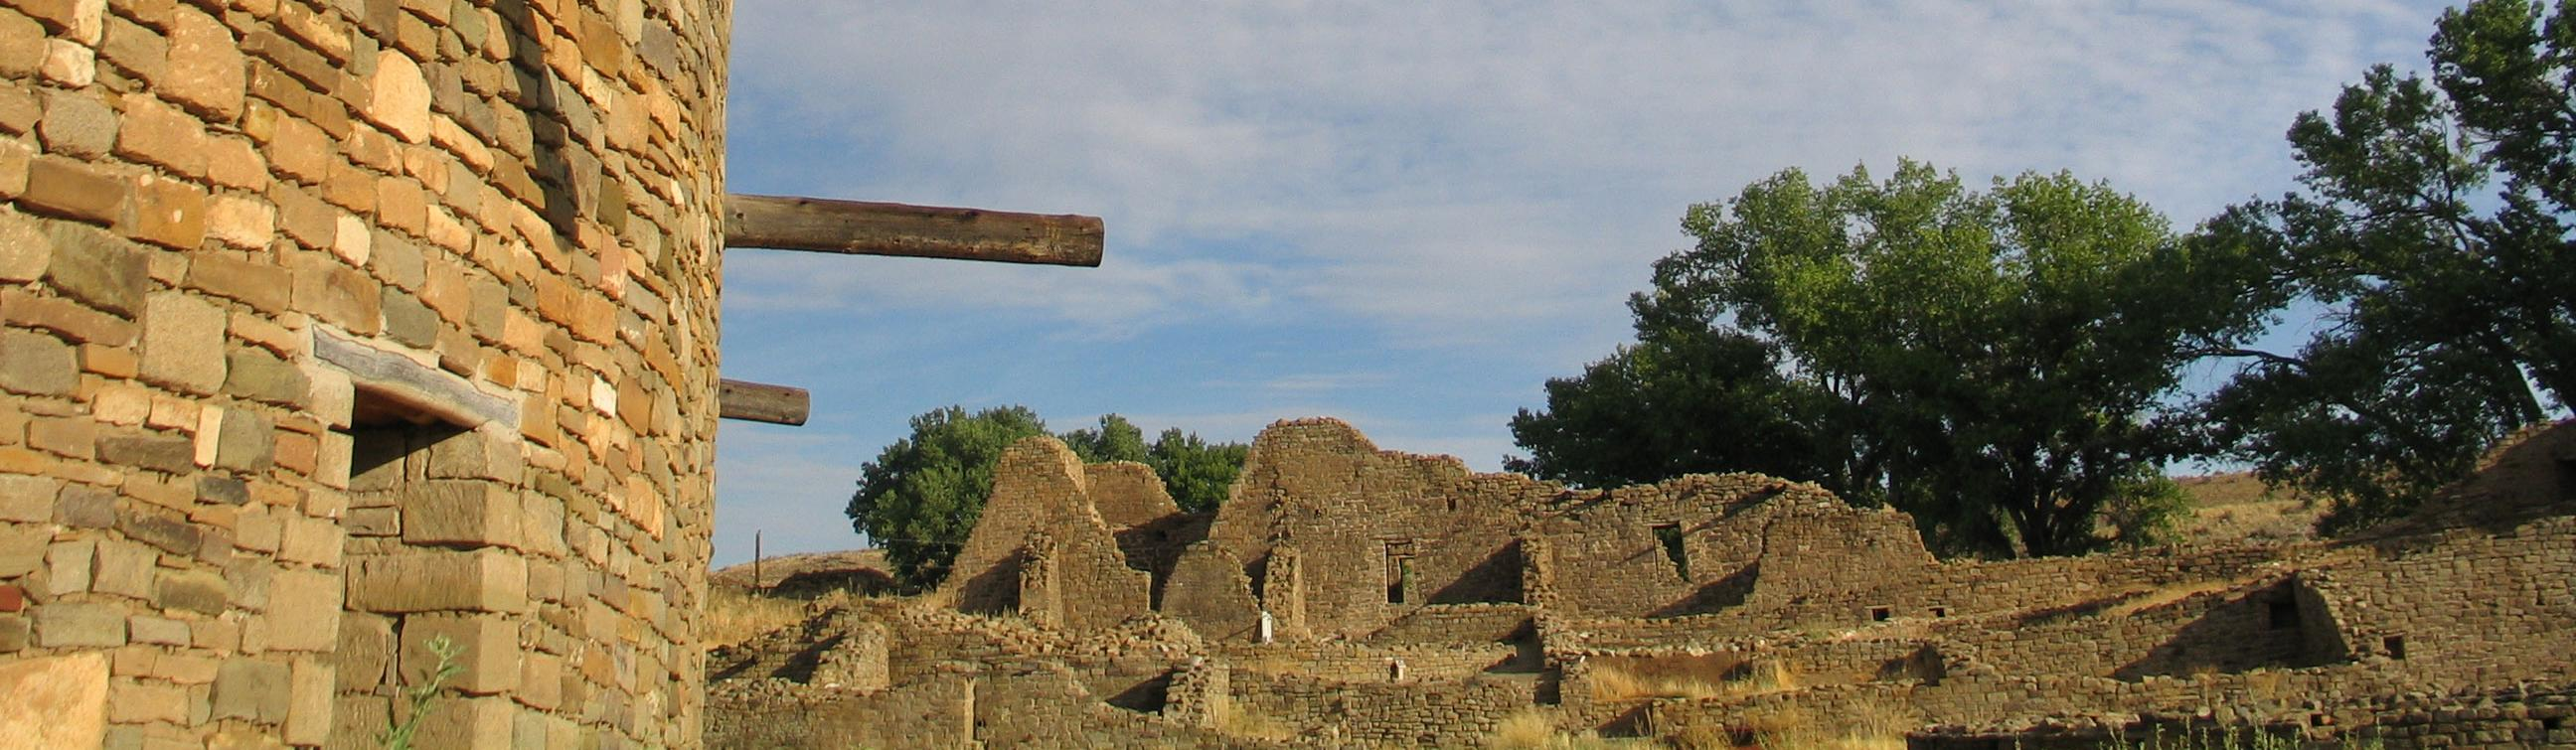 Aztec Ruins National Monument U S National Park Service